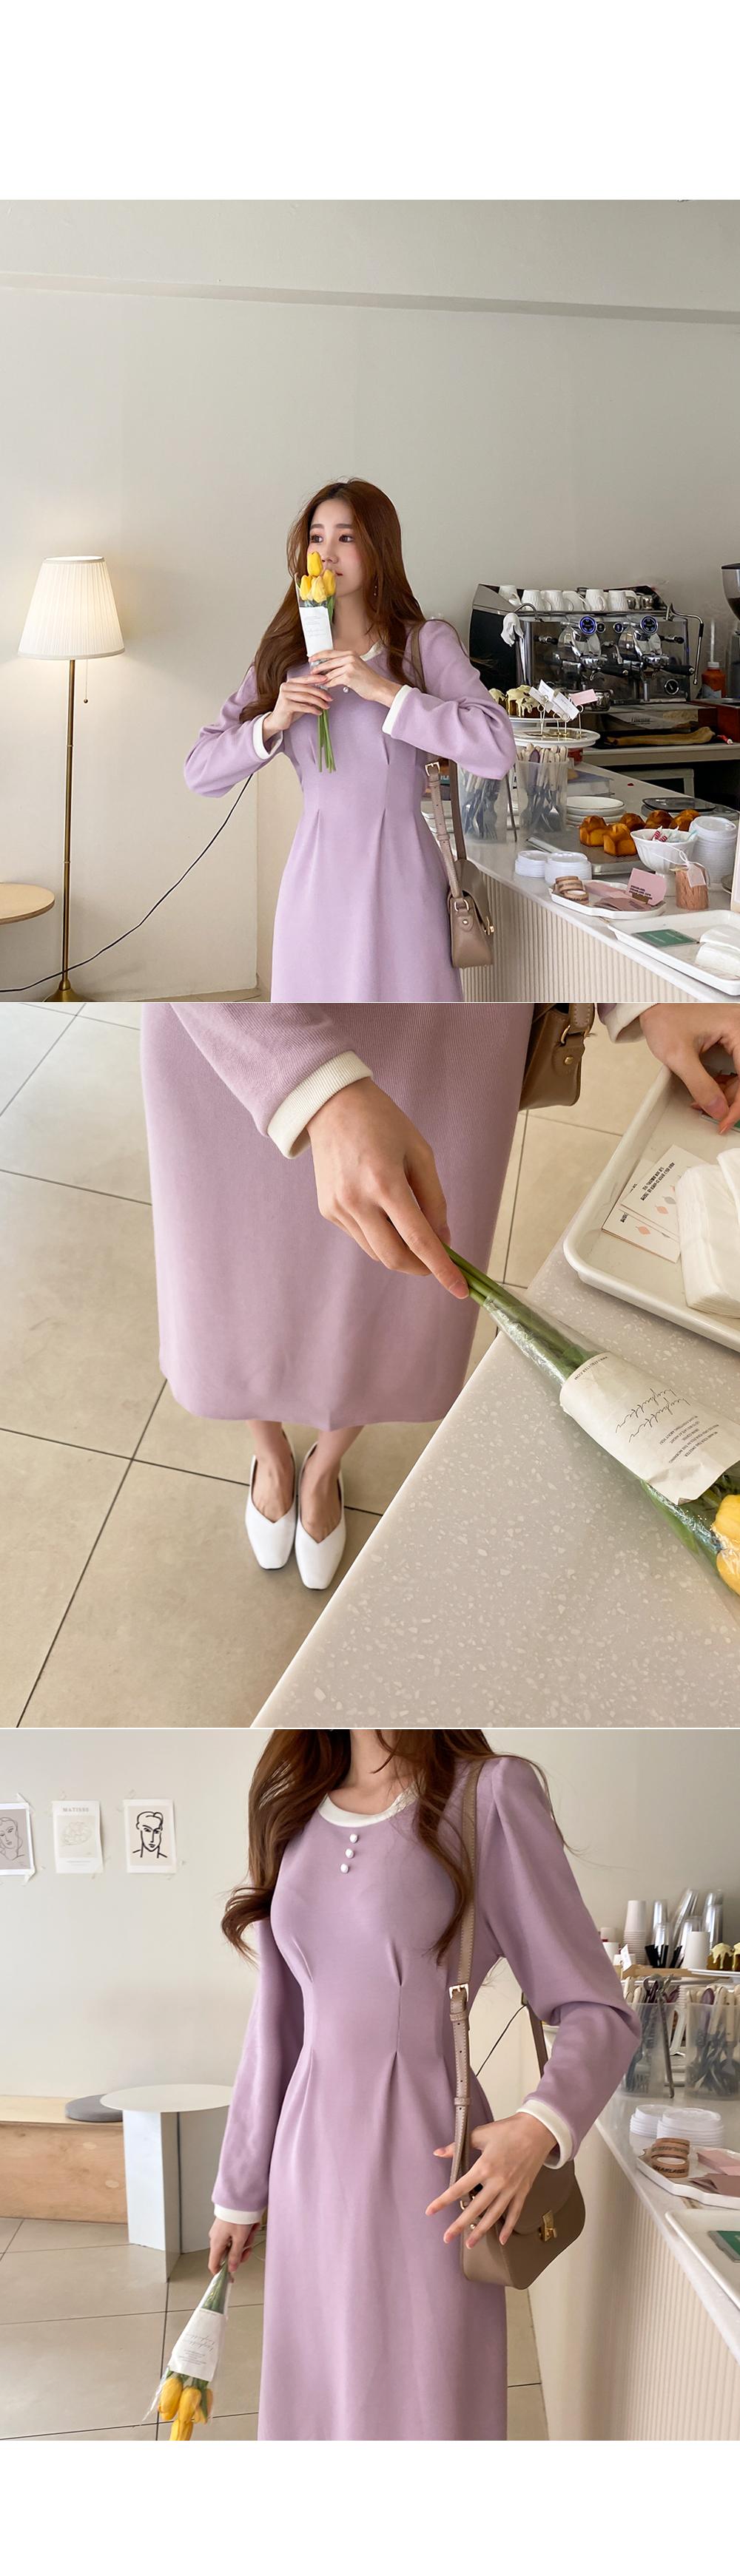 Melodrama color pearl dress